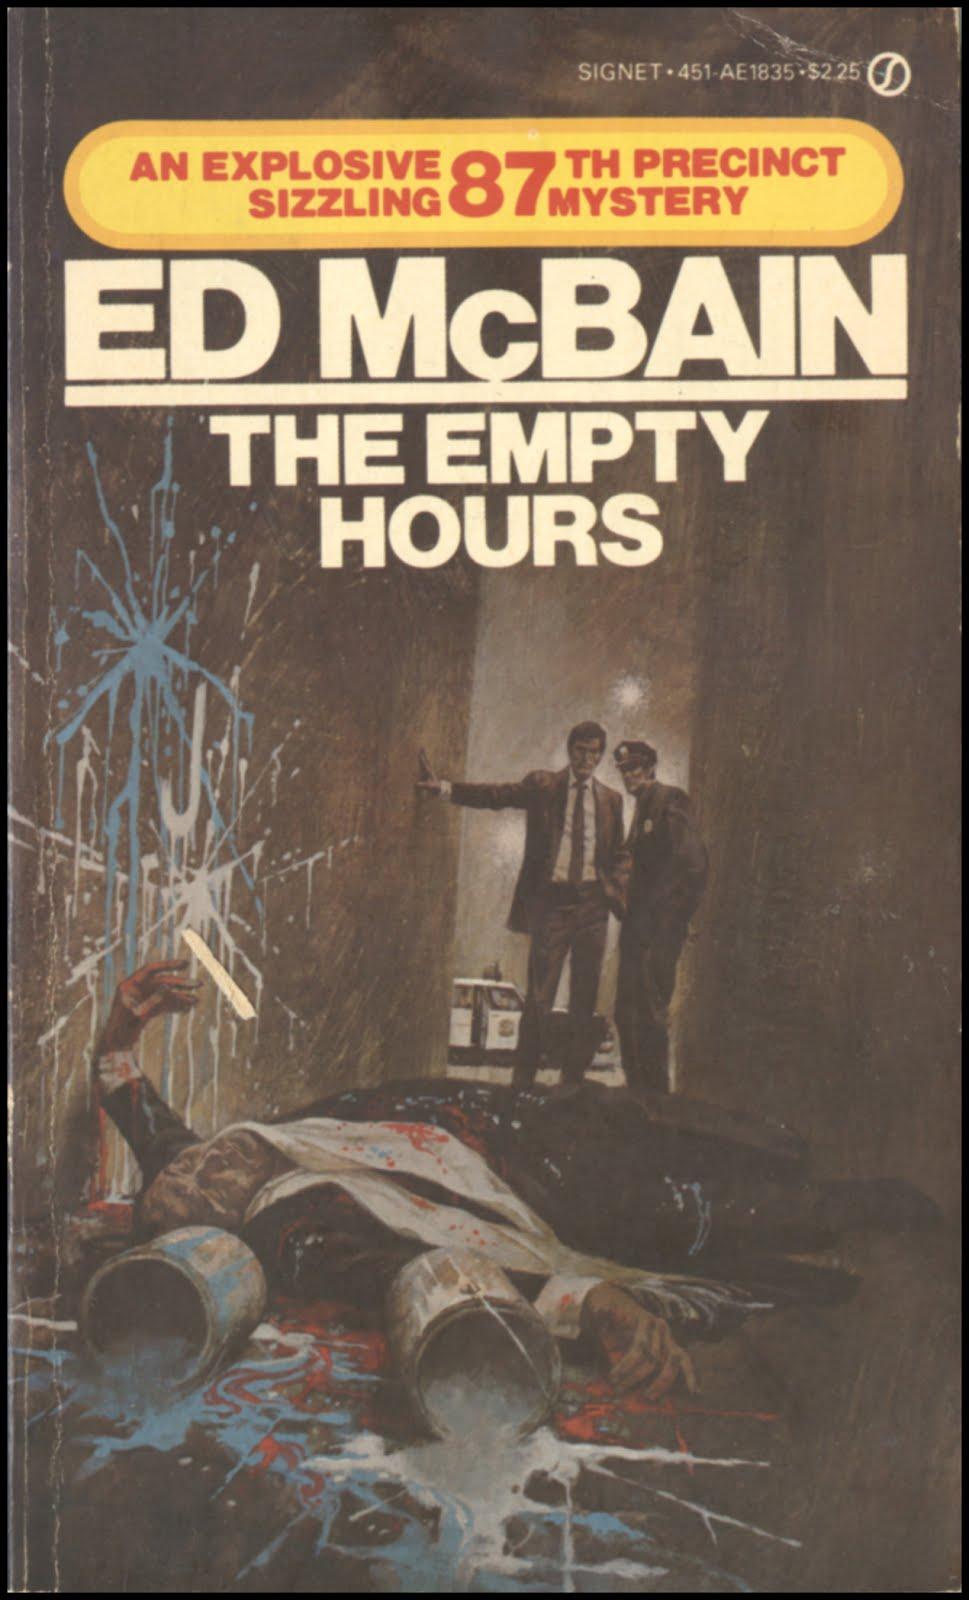 Ed Mcbain